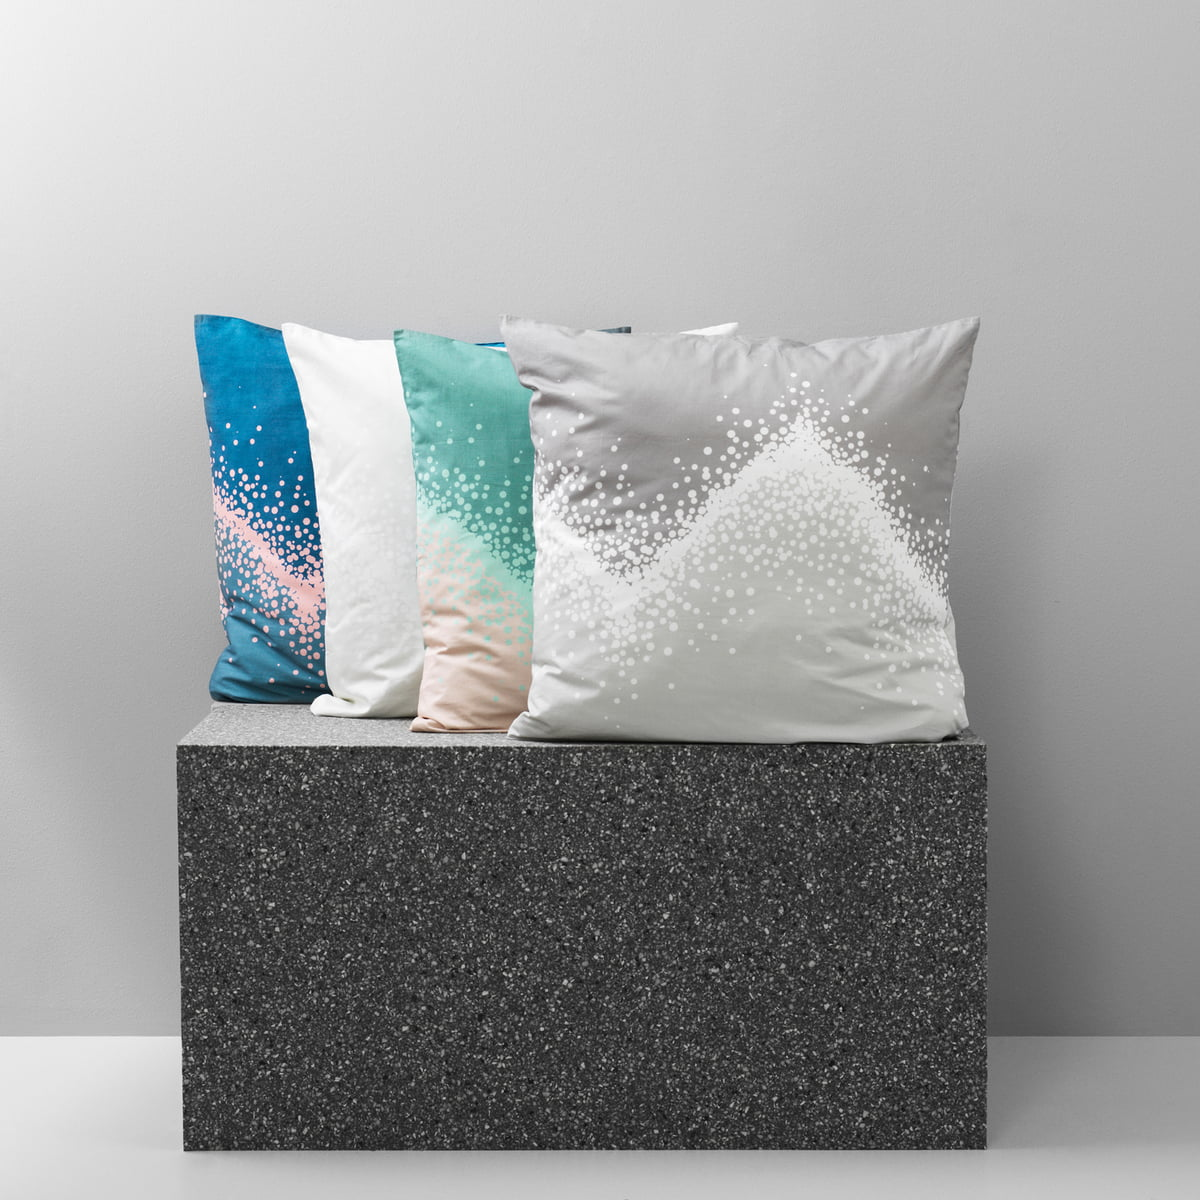 parure de lit sprinkle de normann copenhagen. Black Bedroom Furniture Sets. Home Design Ideas